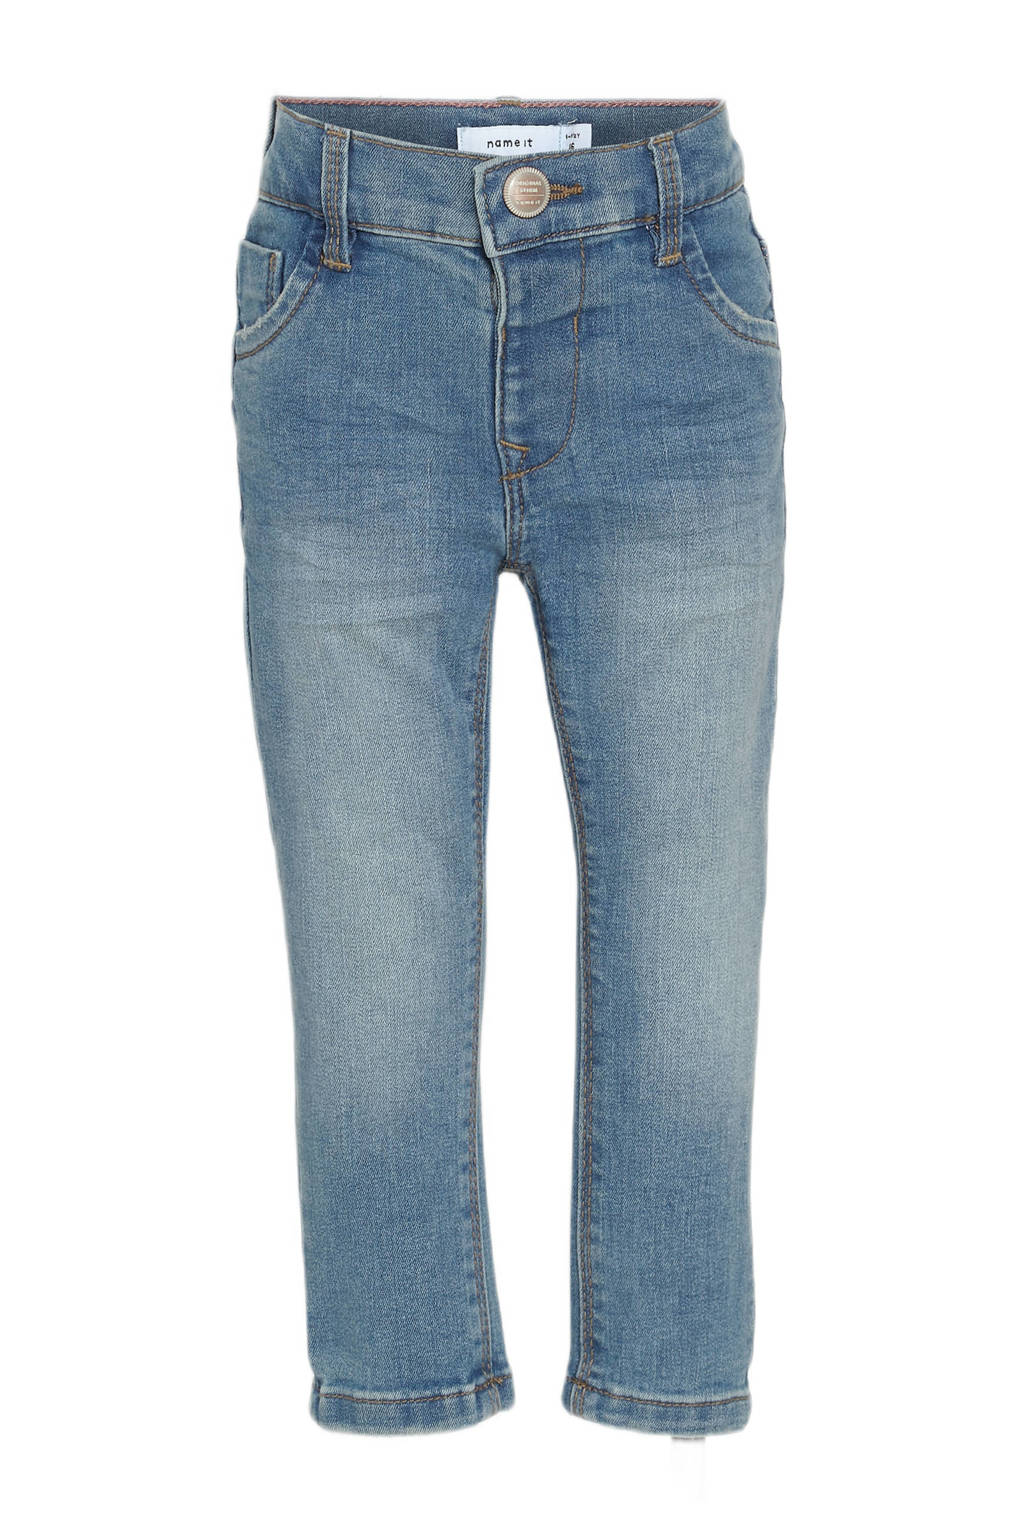 NAME IT MINI skinny jeans NMFPOLLY stonewashed, Stonewashed